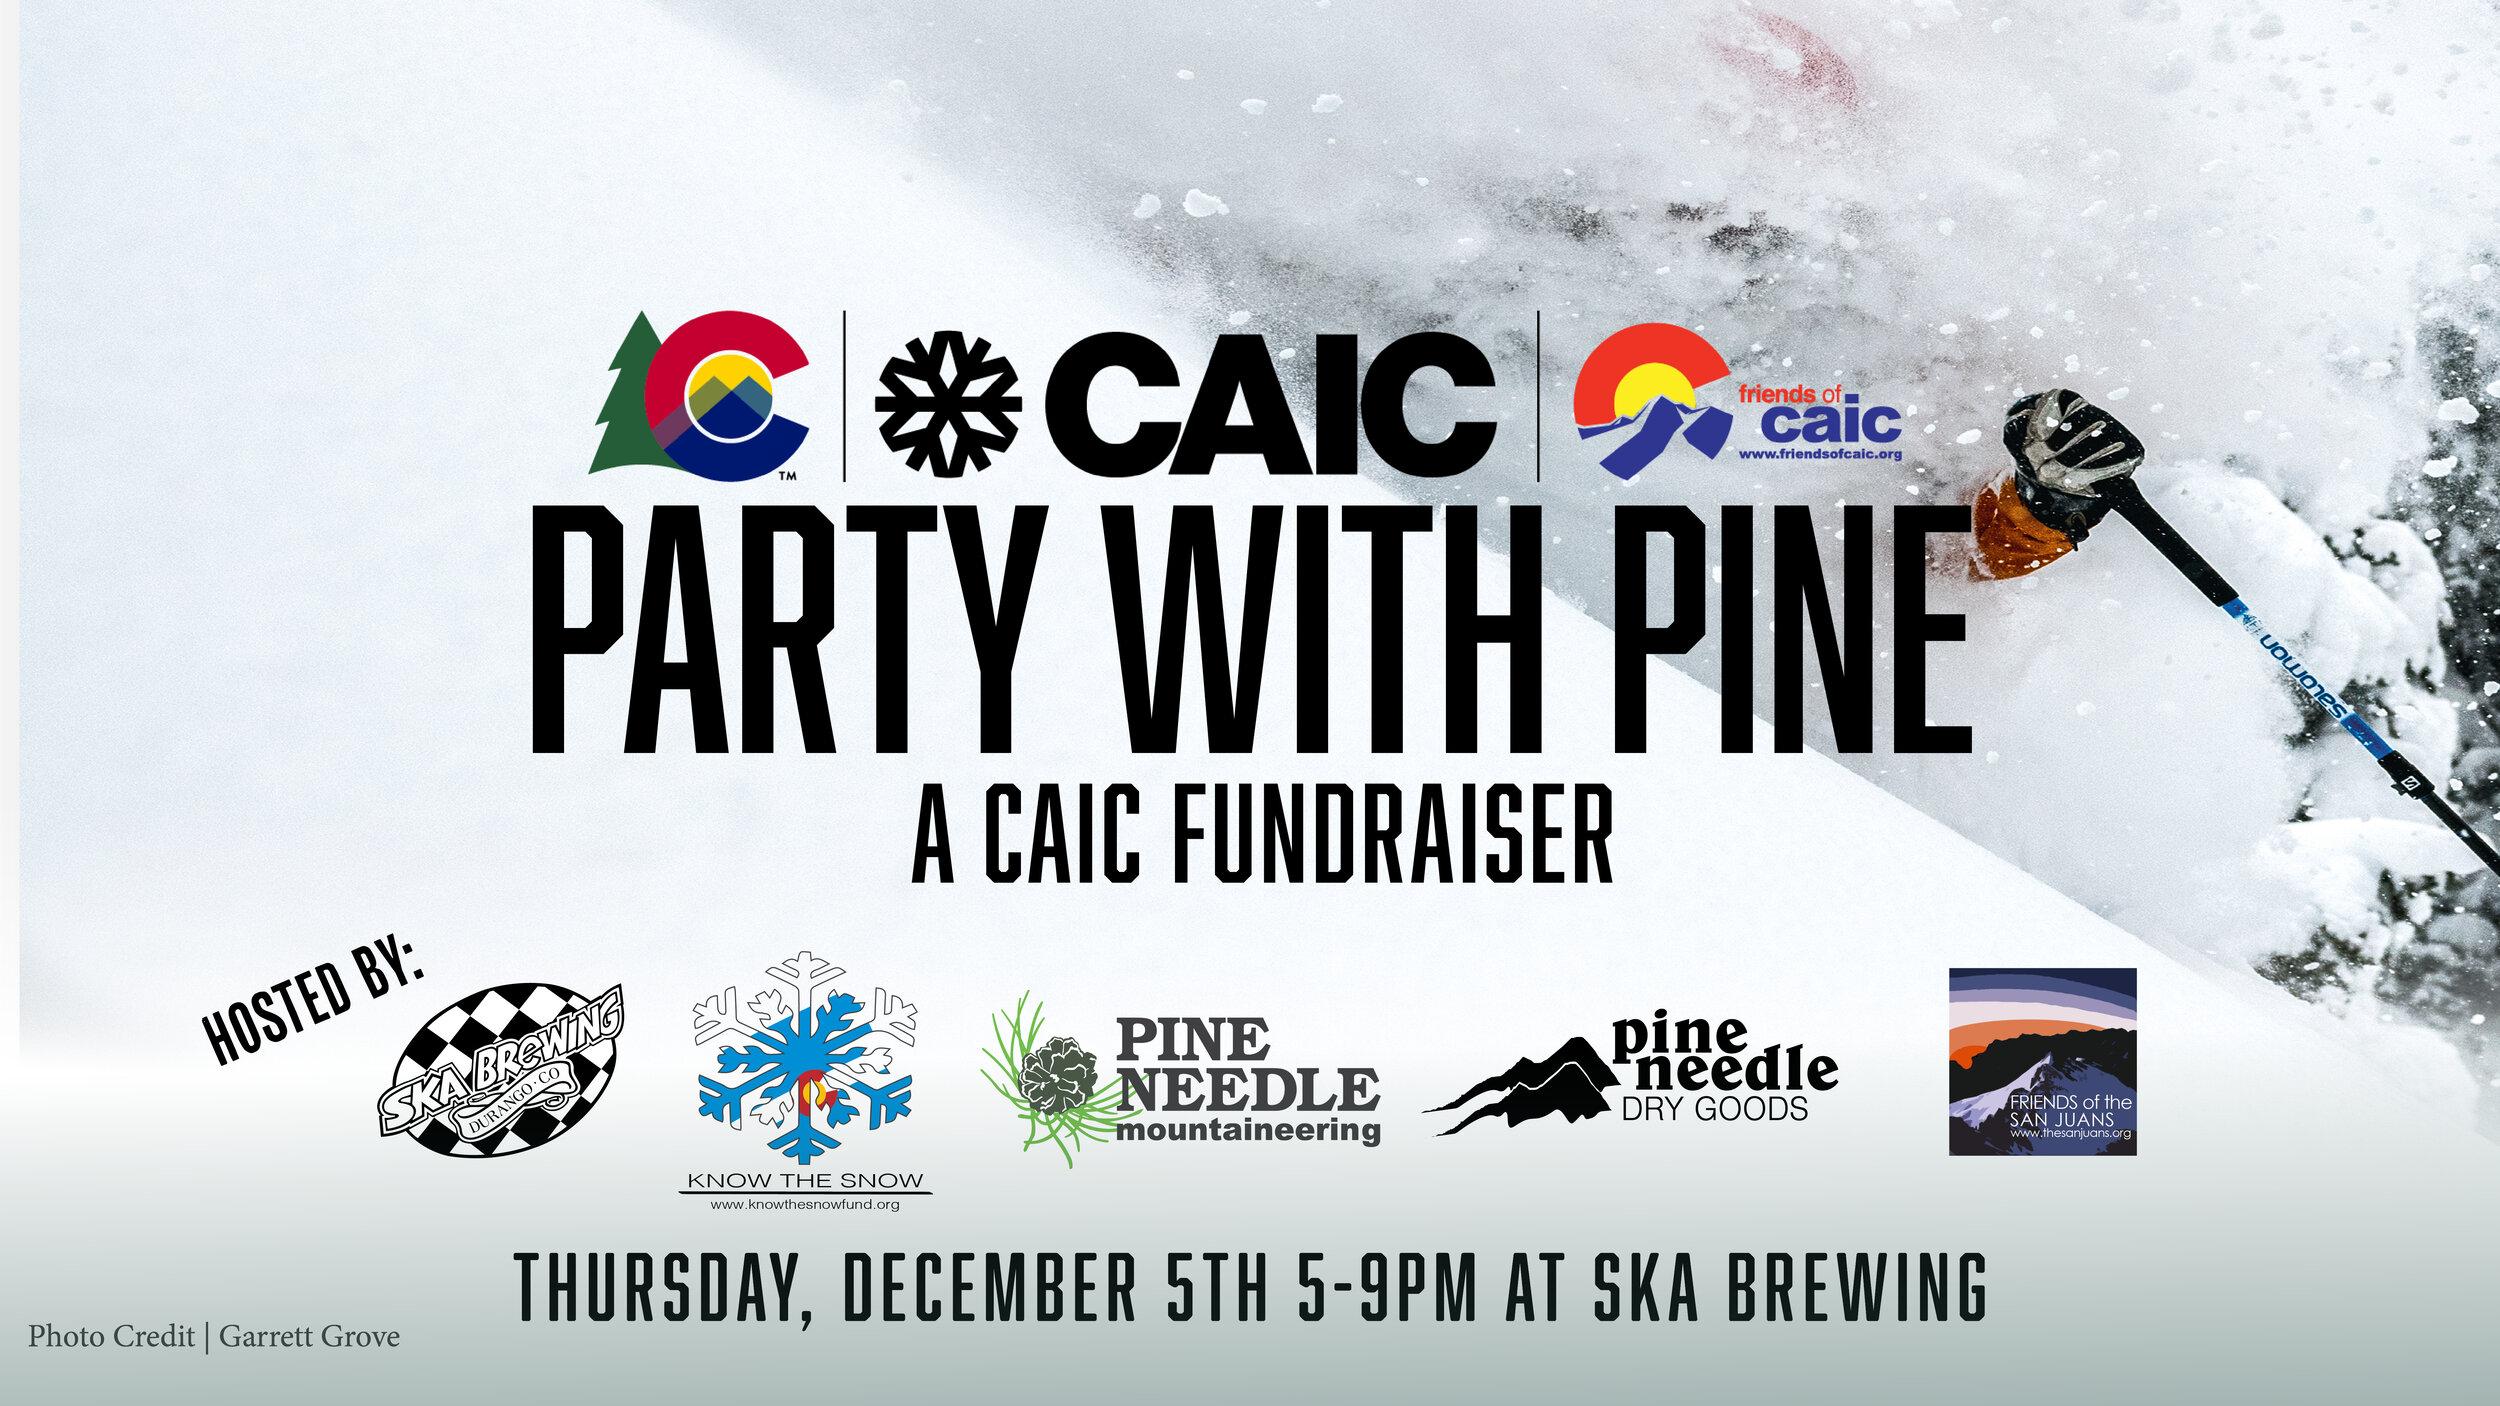 CAIC Fundraiser 2019 - Facebook Event.jpg